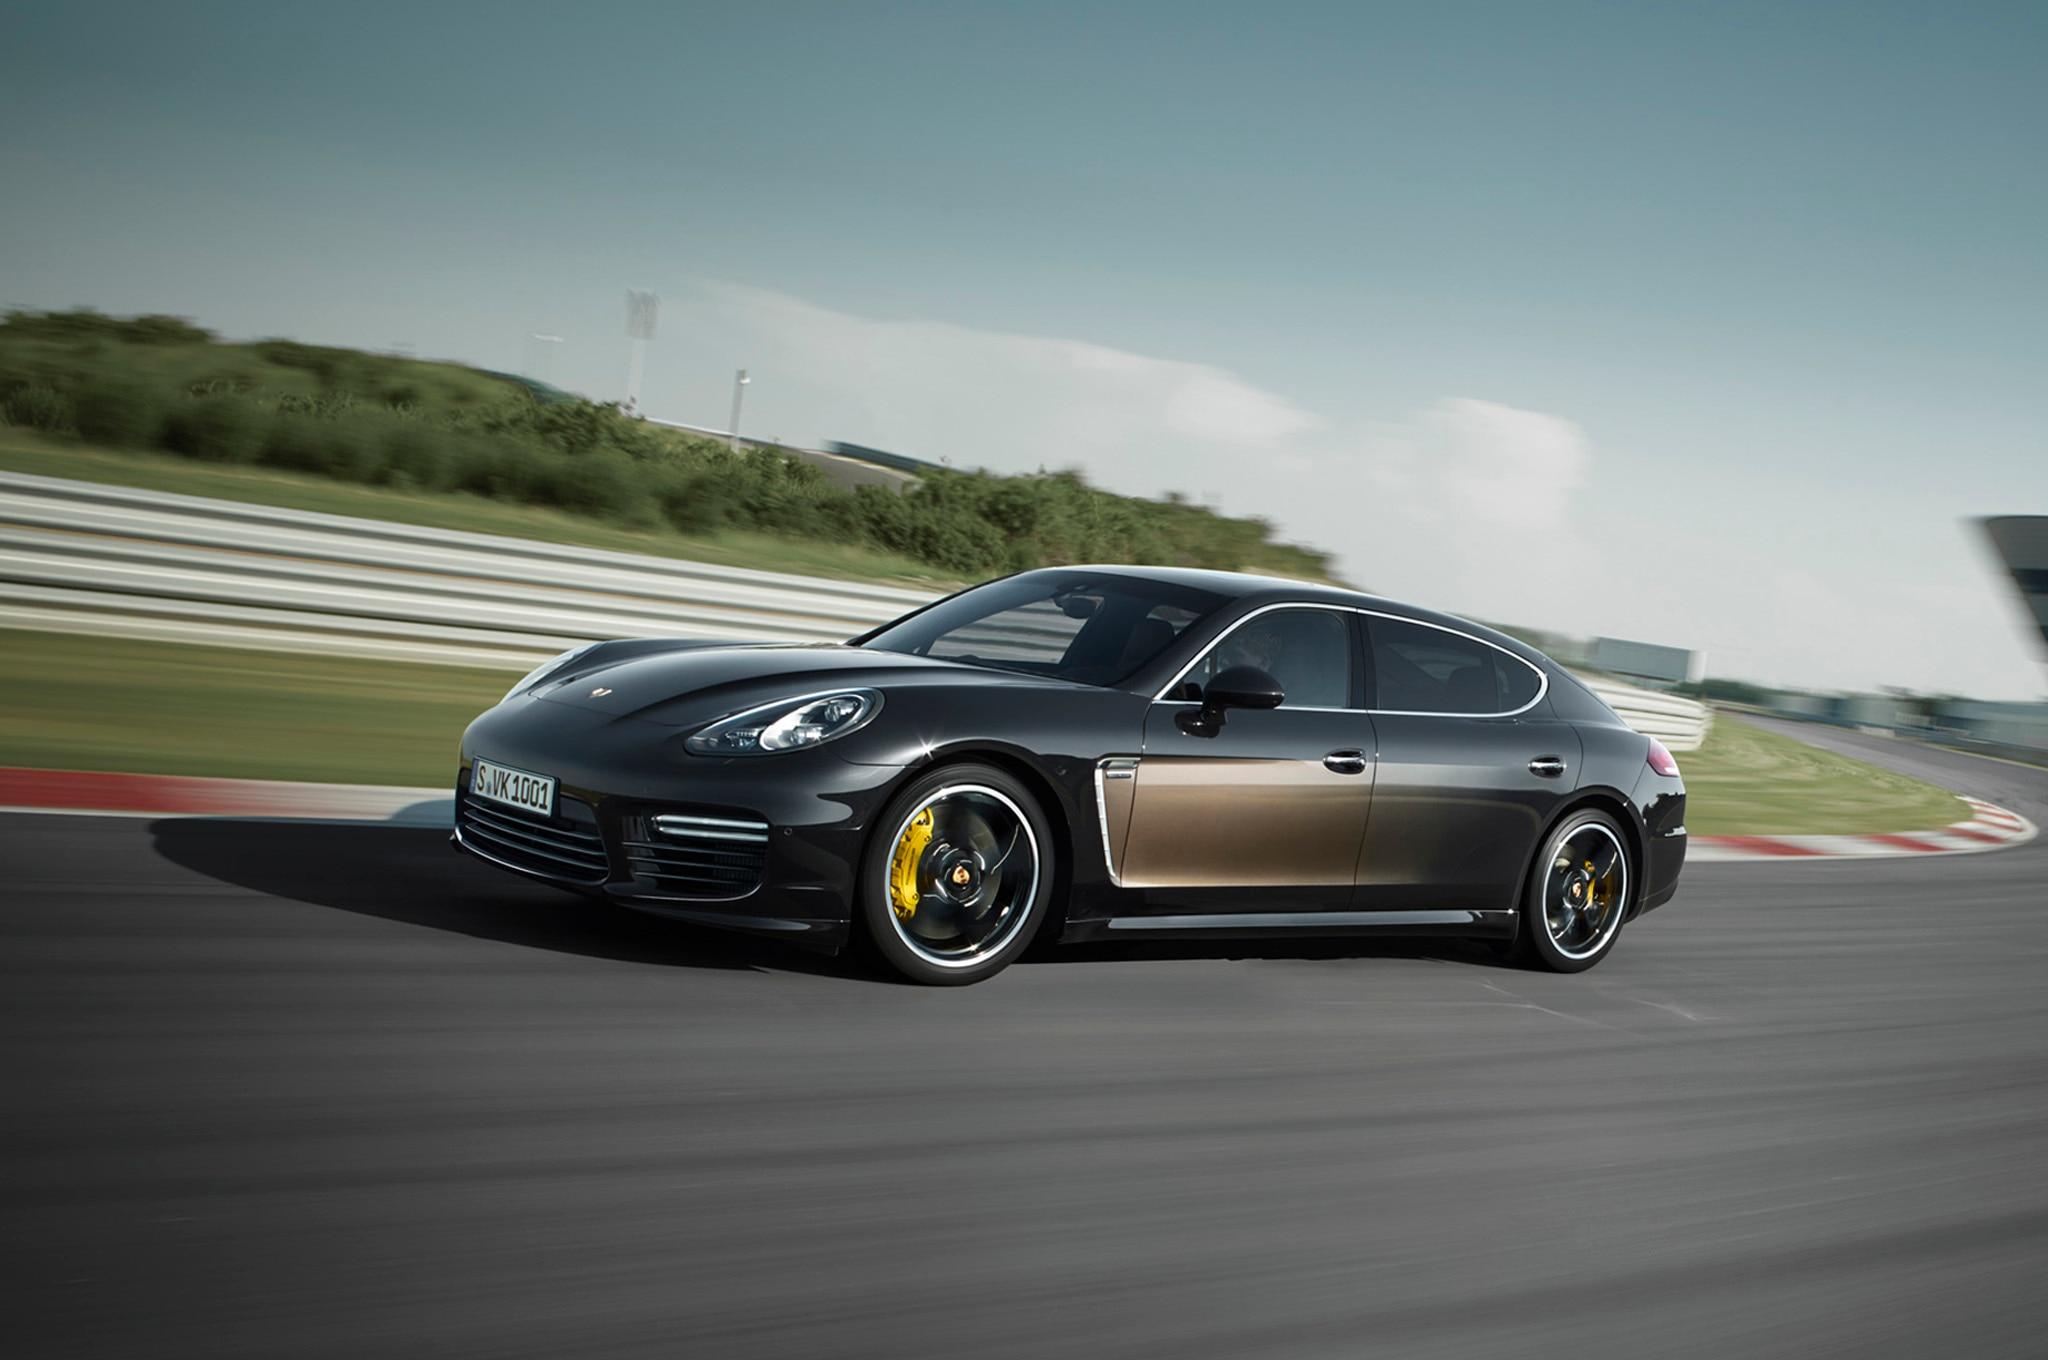 2015 Porsche Panamera Exclusive Series Front Three Quarter In Motion